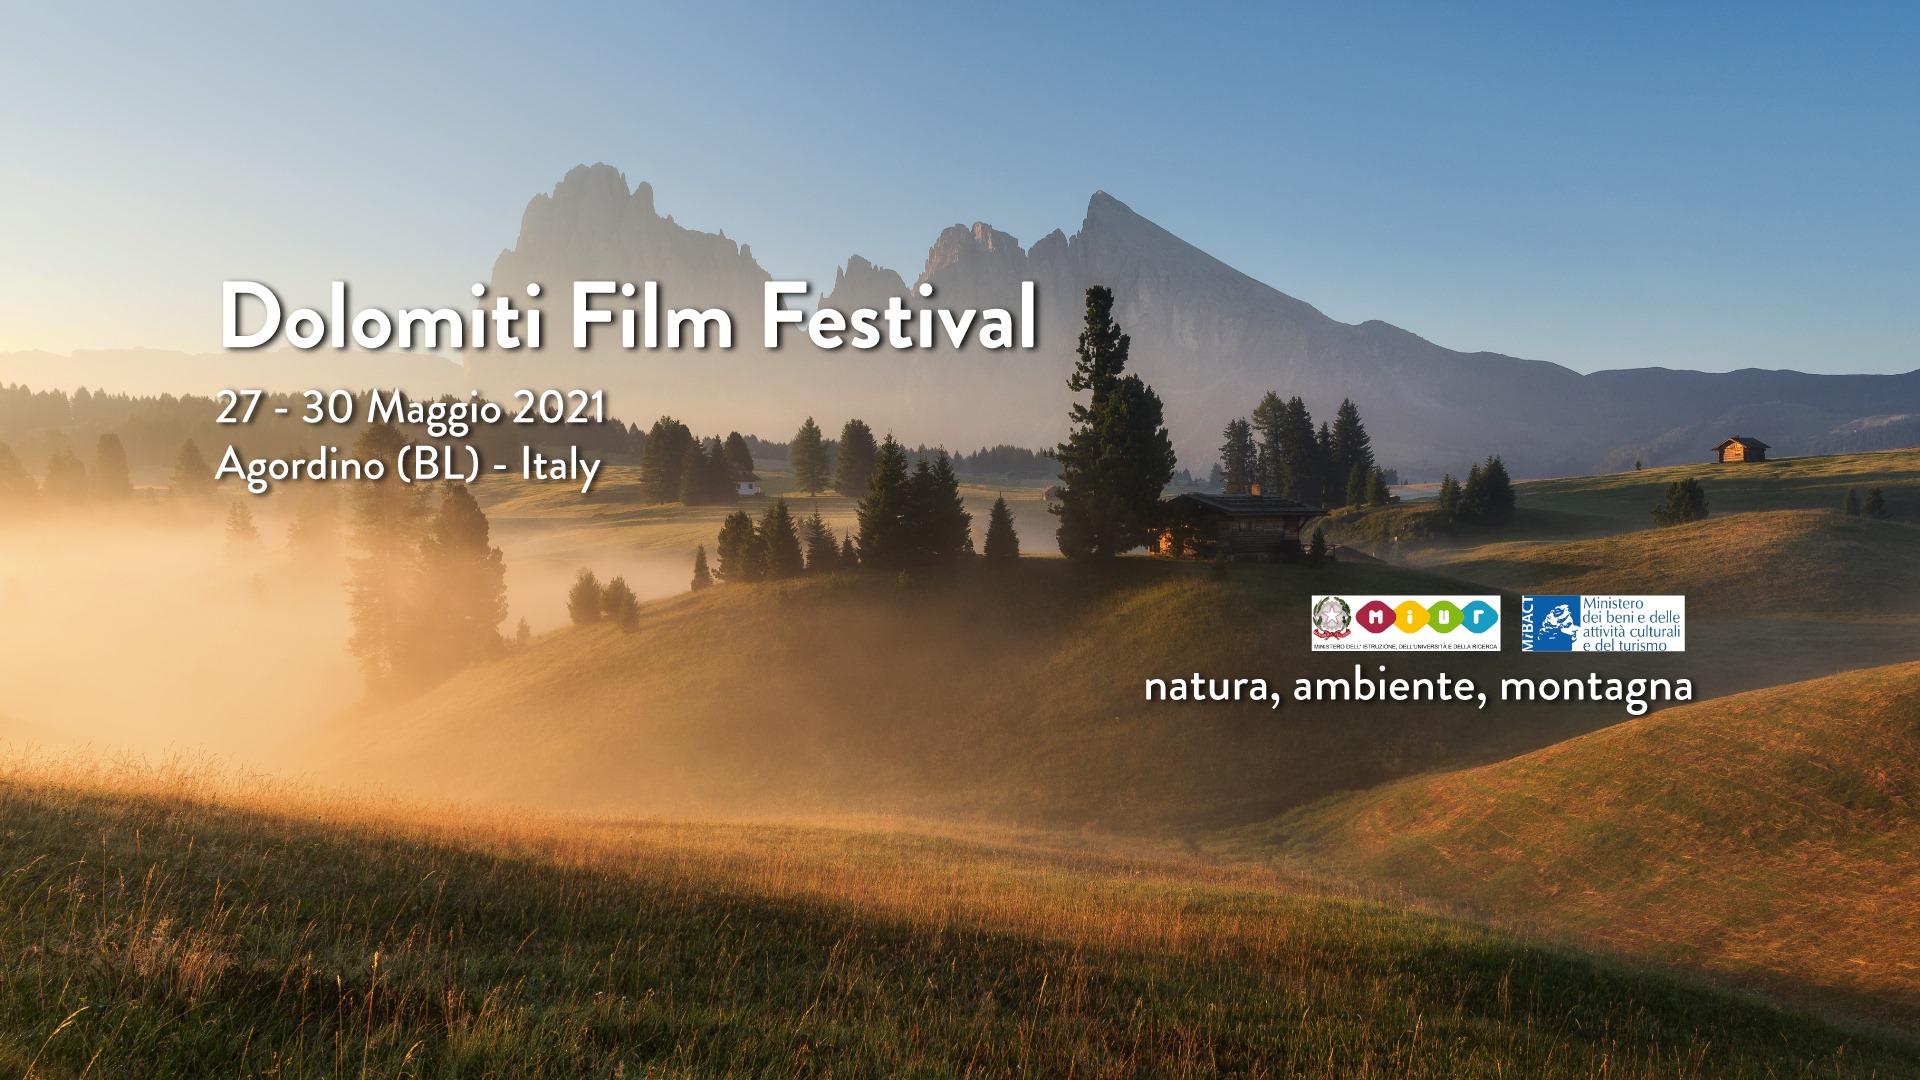 dolomiti-film-festival